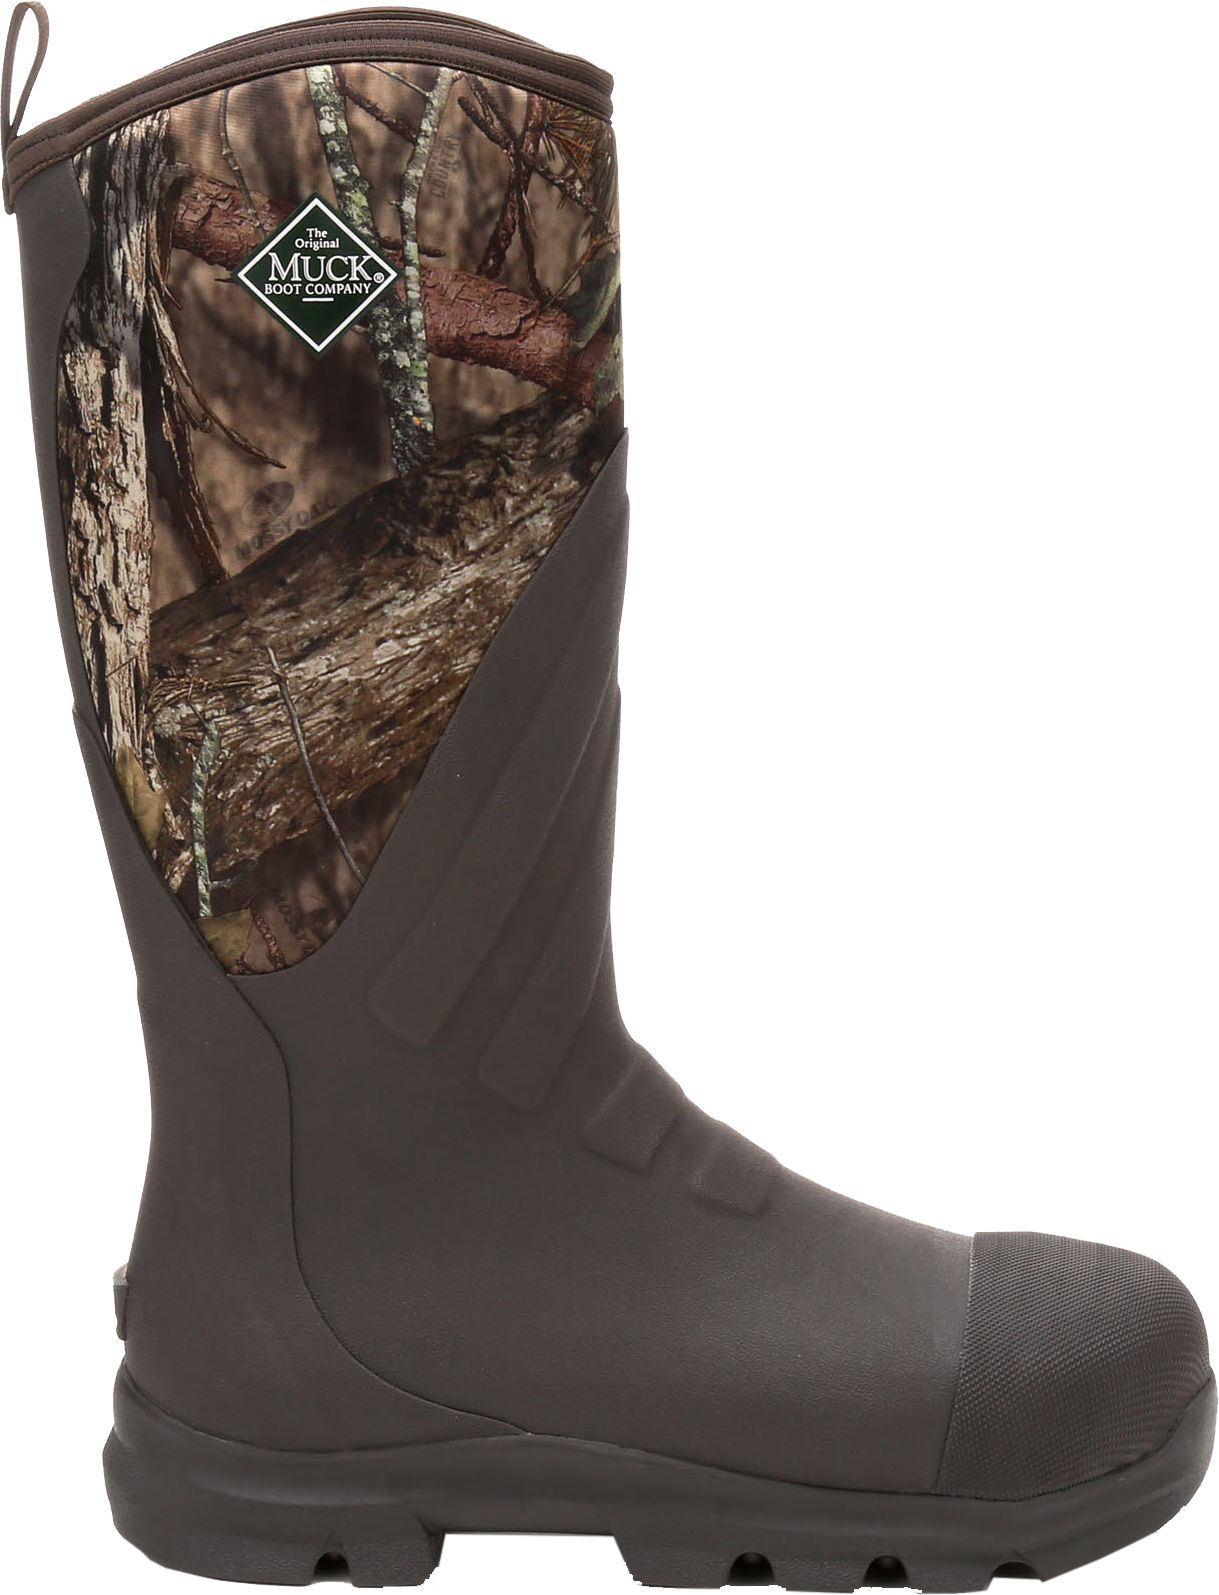 Muck Boots Camo - Cr Boot